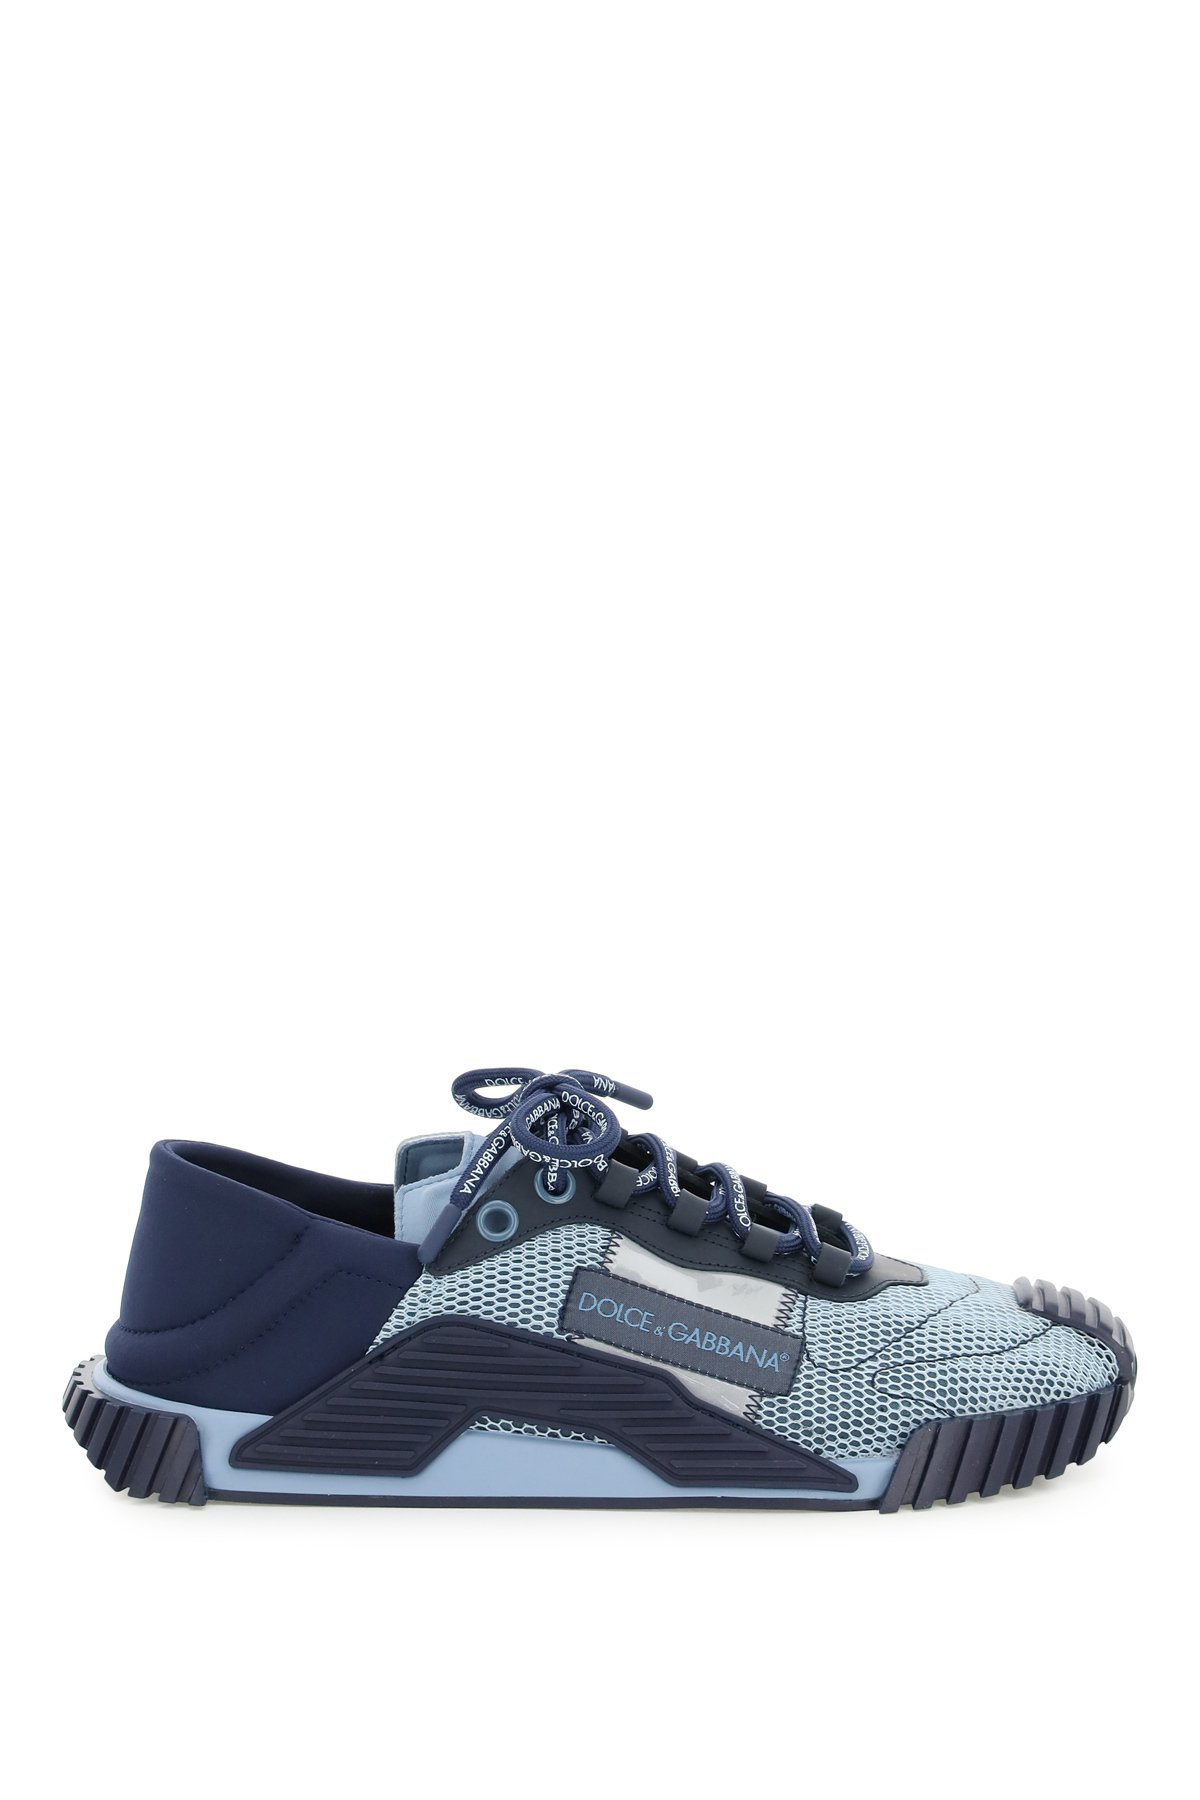 Dolce & gabbana ns1 neoprene sneakers